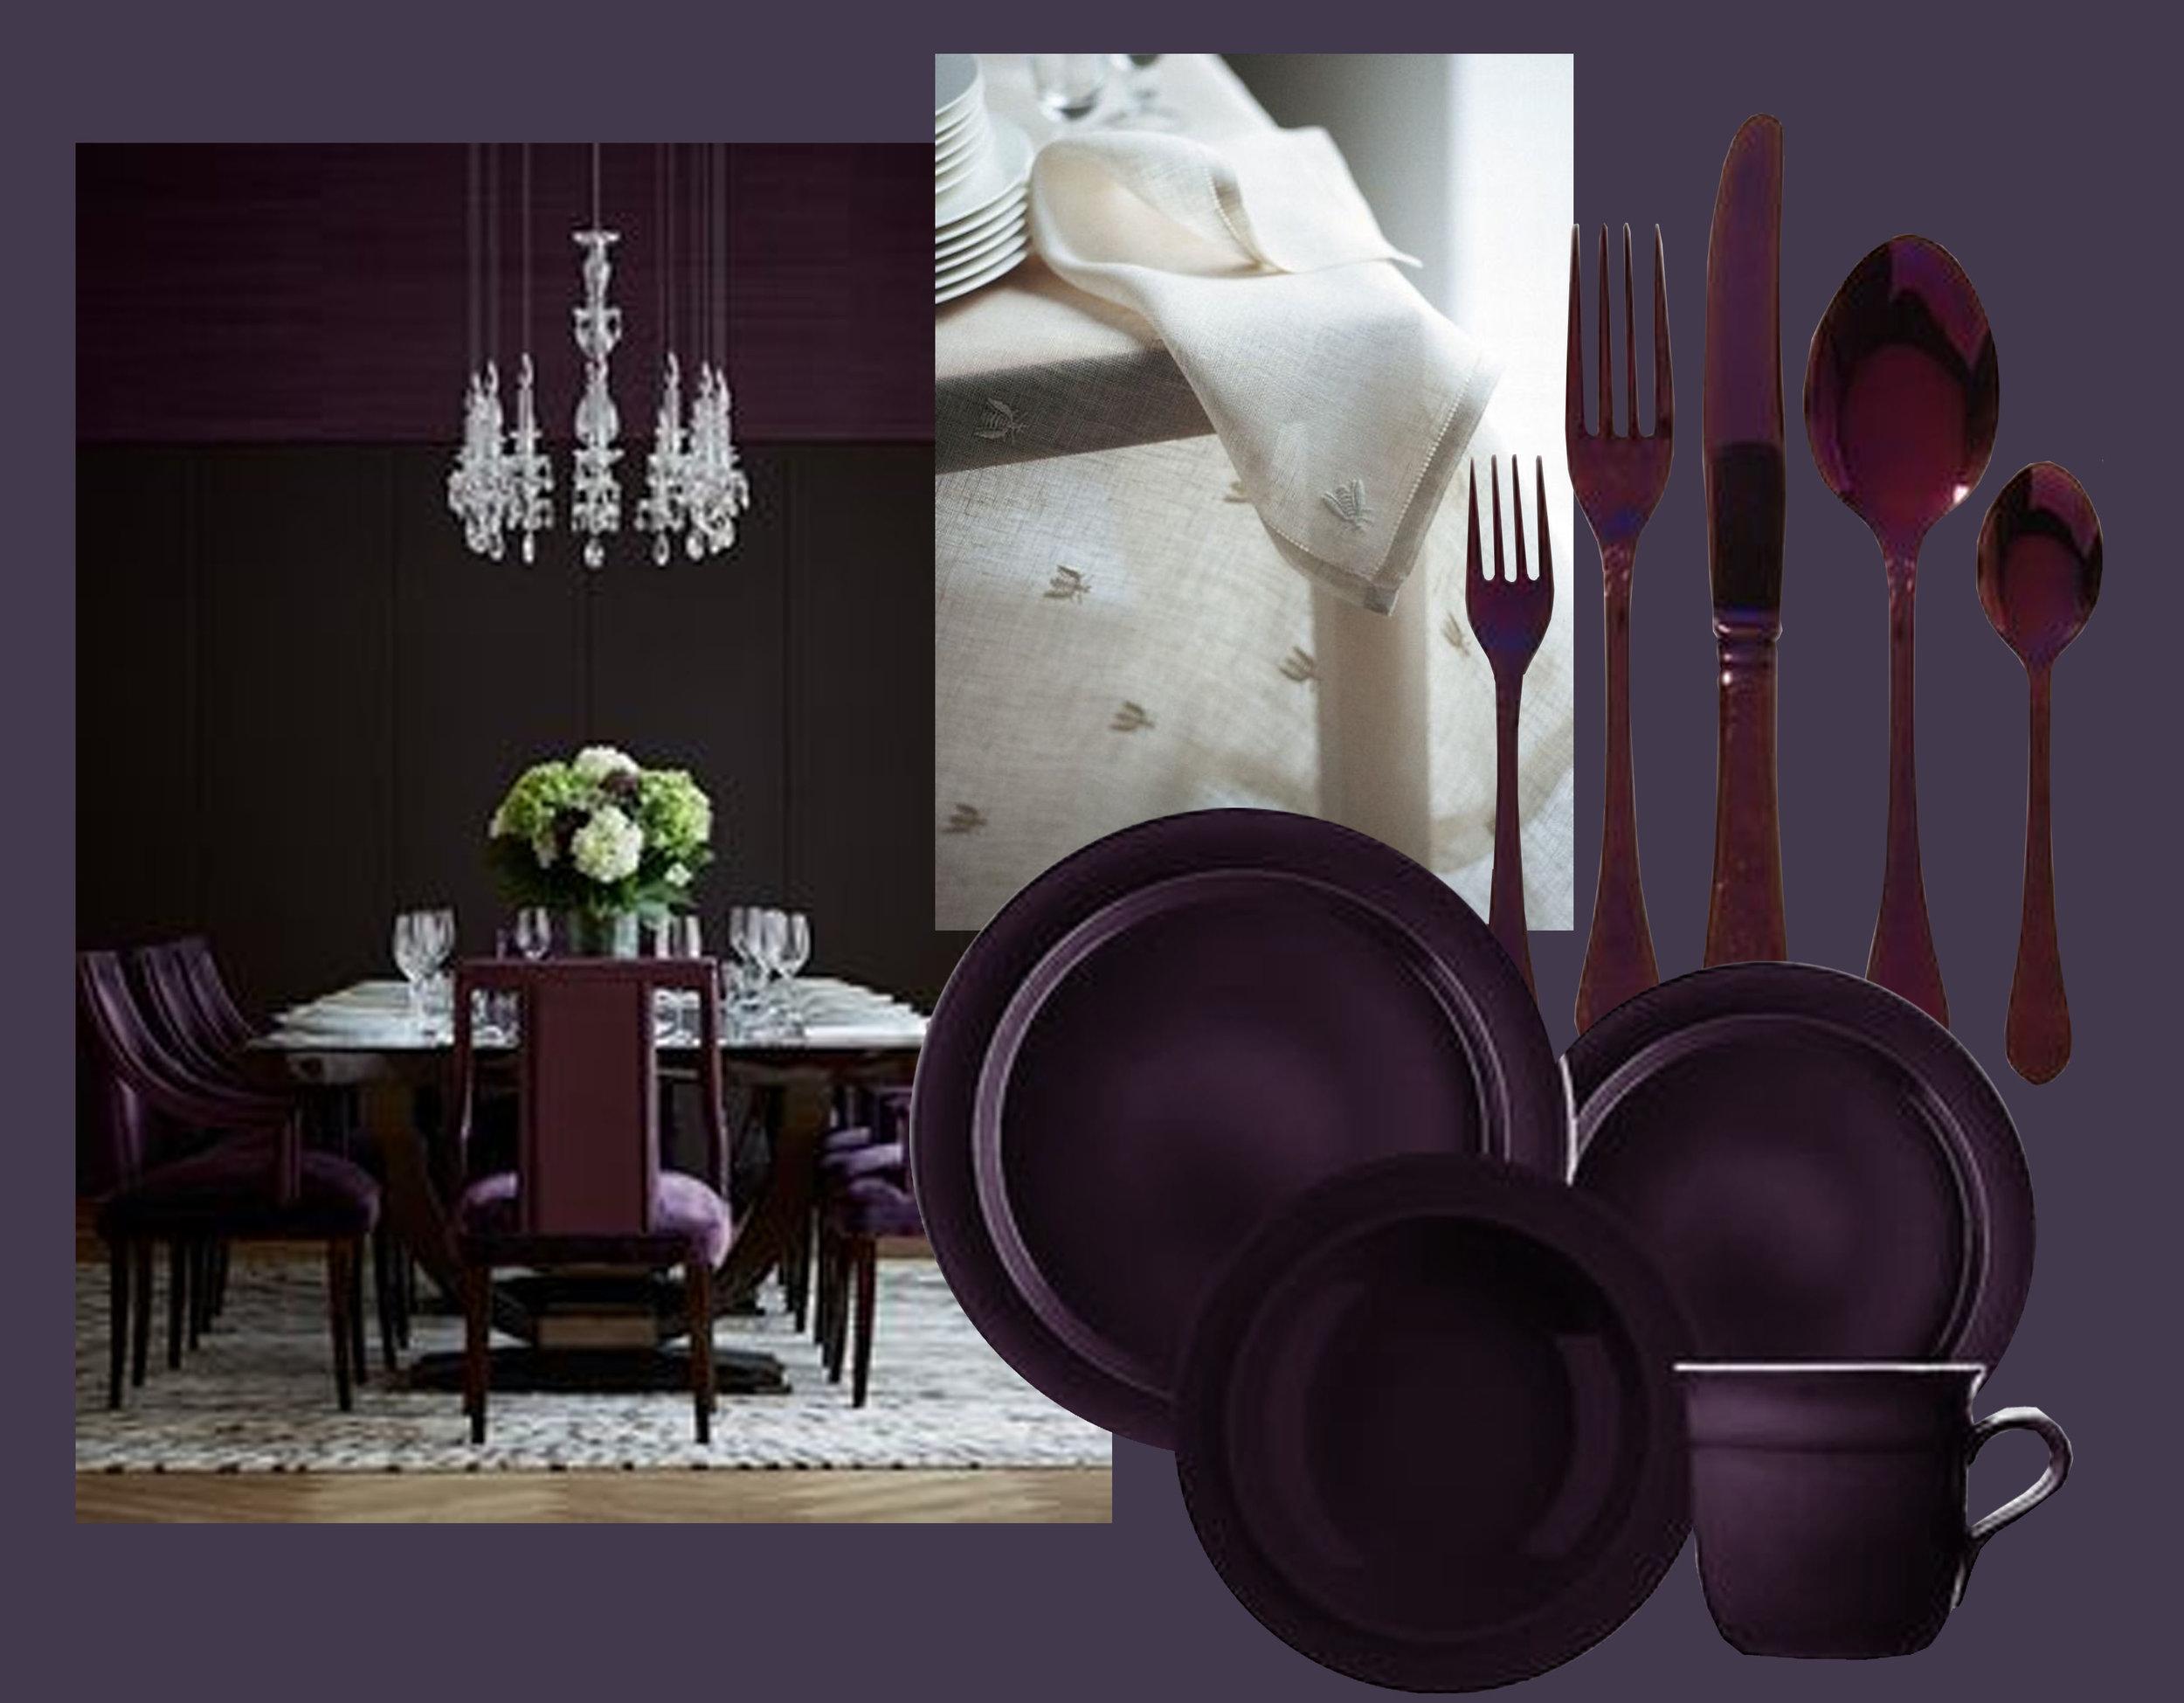 image dining via  Decor & Style  - table linen  Tina Motto  - tableware  Emile Henry - cutlery via  Pinterest